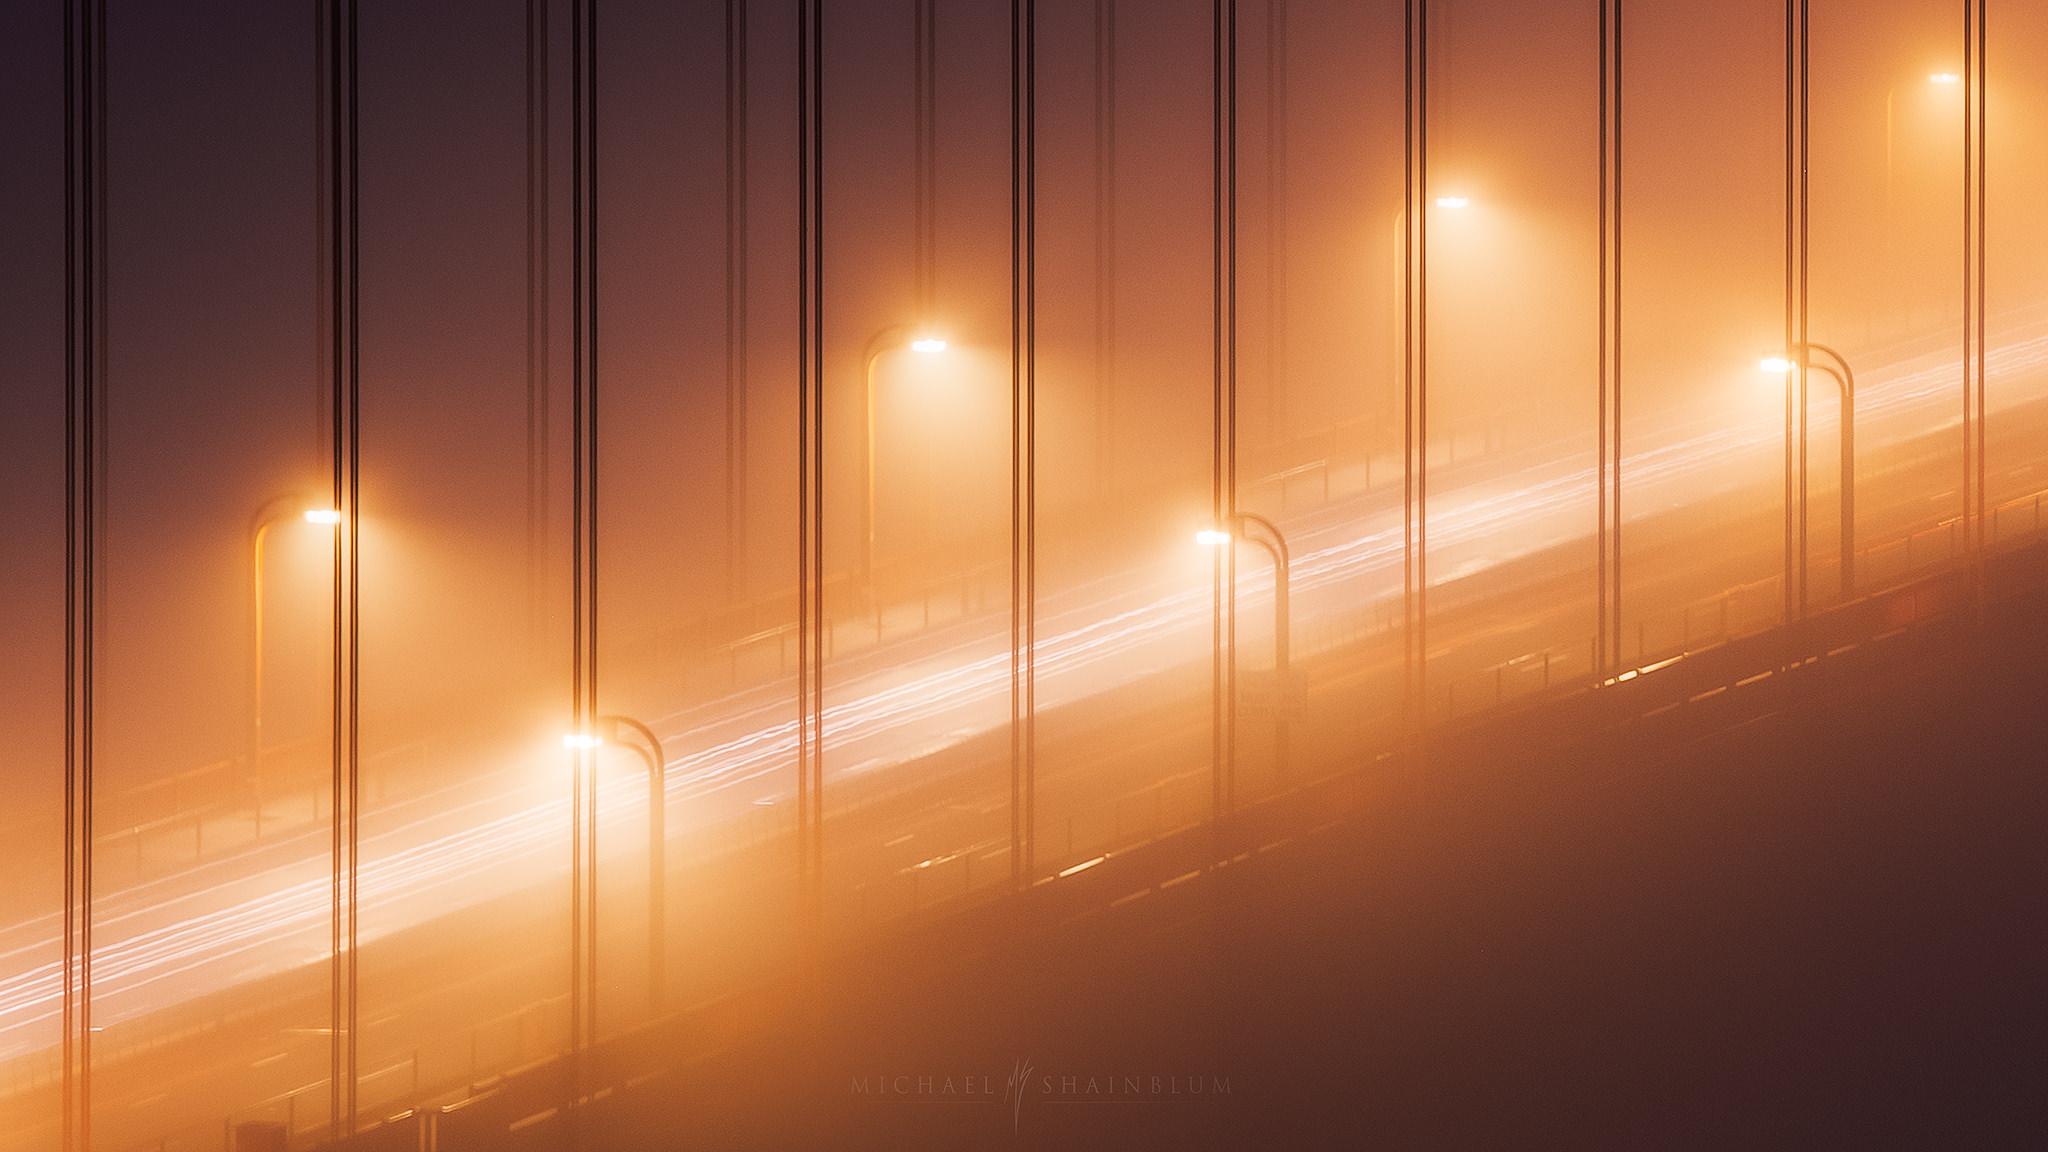 San Francisco Photography, Golden Gate Bridge Fog